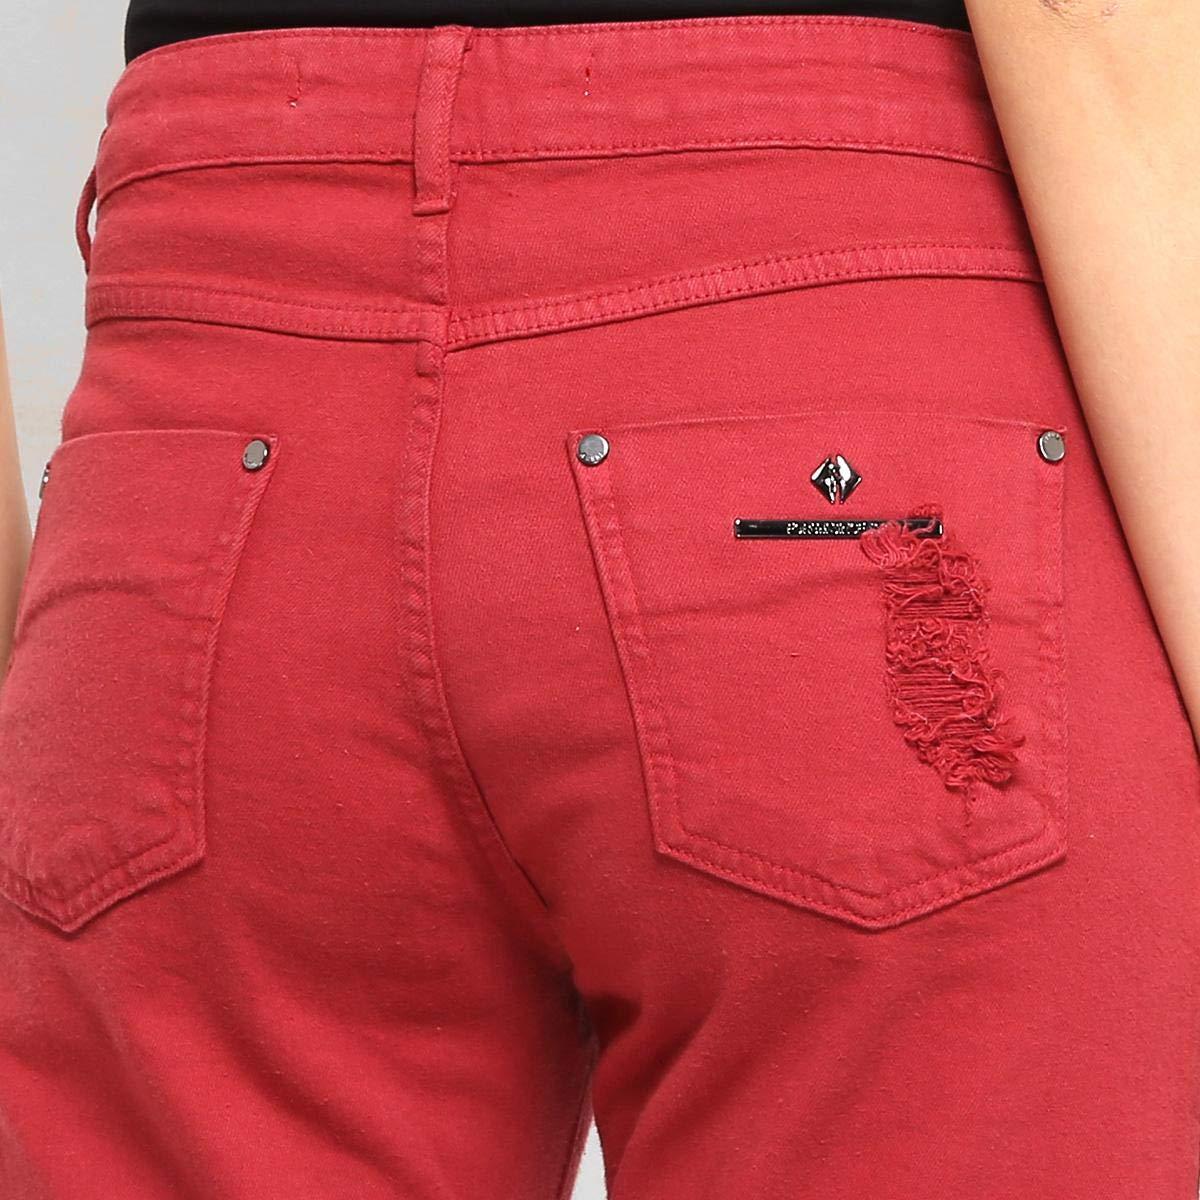 6b8f37153 Calça Sarja Forum Cropped Barra Desfiada Feminina - Vermelho - 44:  Amazon.com.br: Amazon Moda